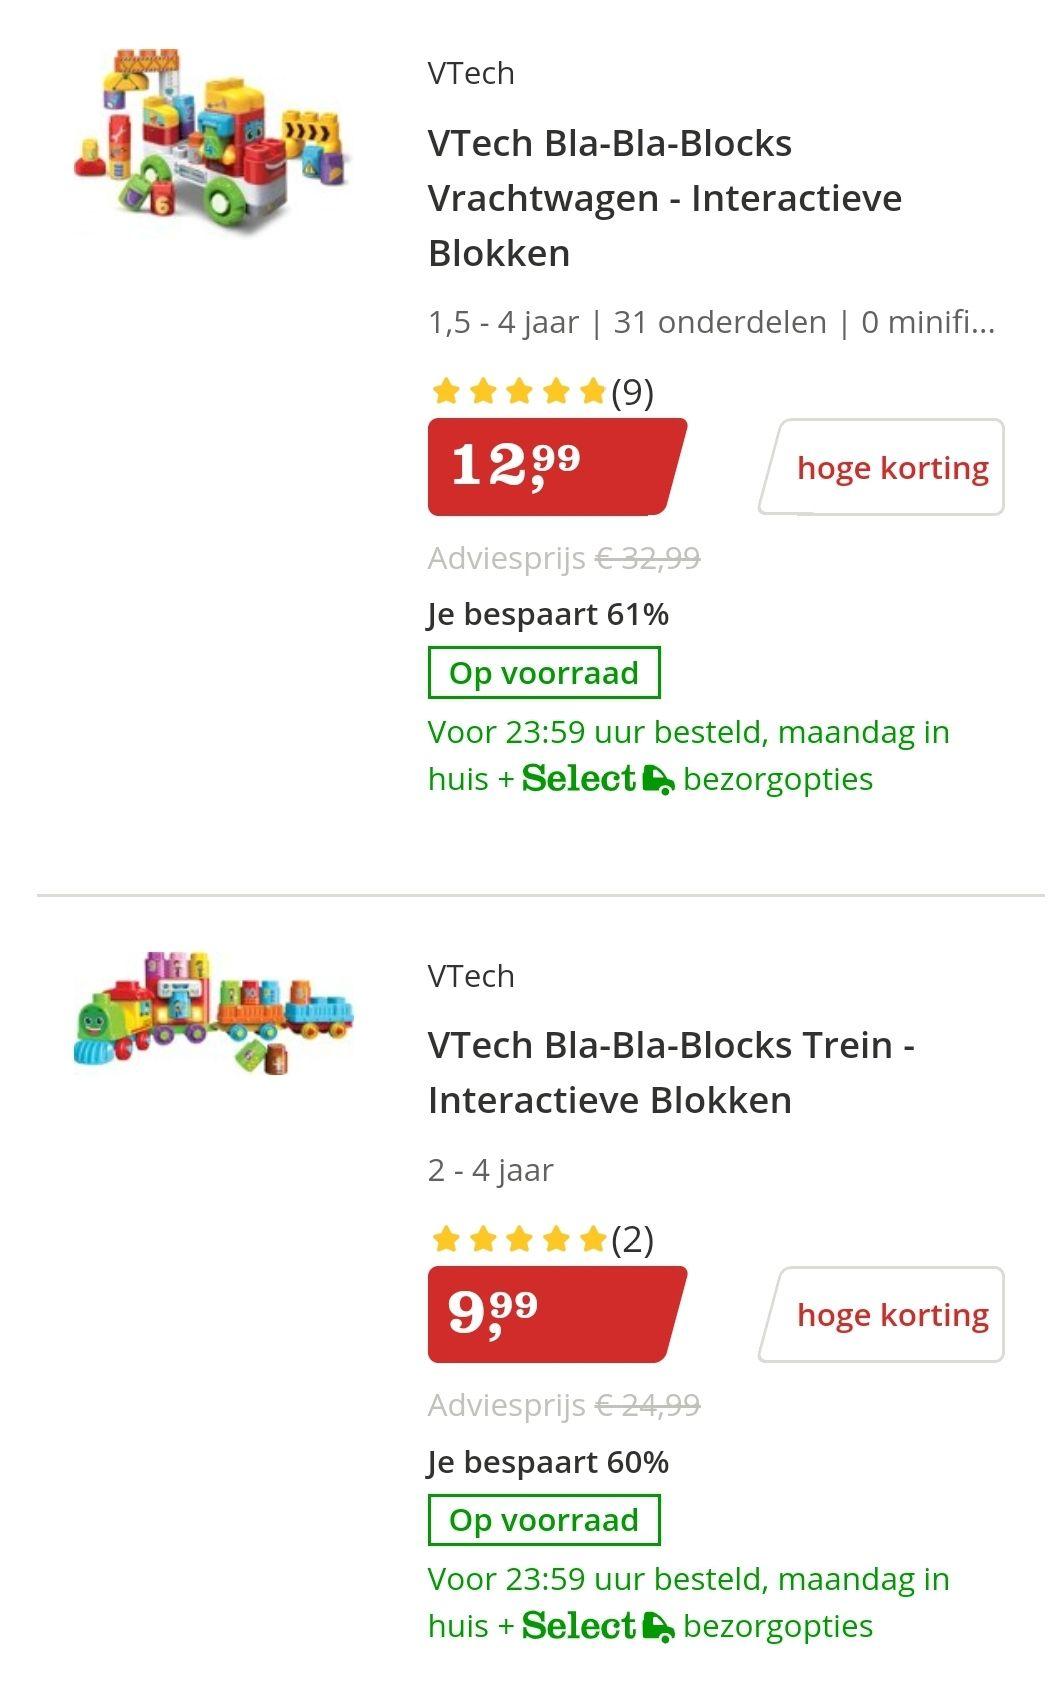 Hoge korting op Vtech Bla Bla Blocks bij Bol.com